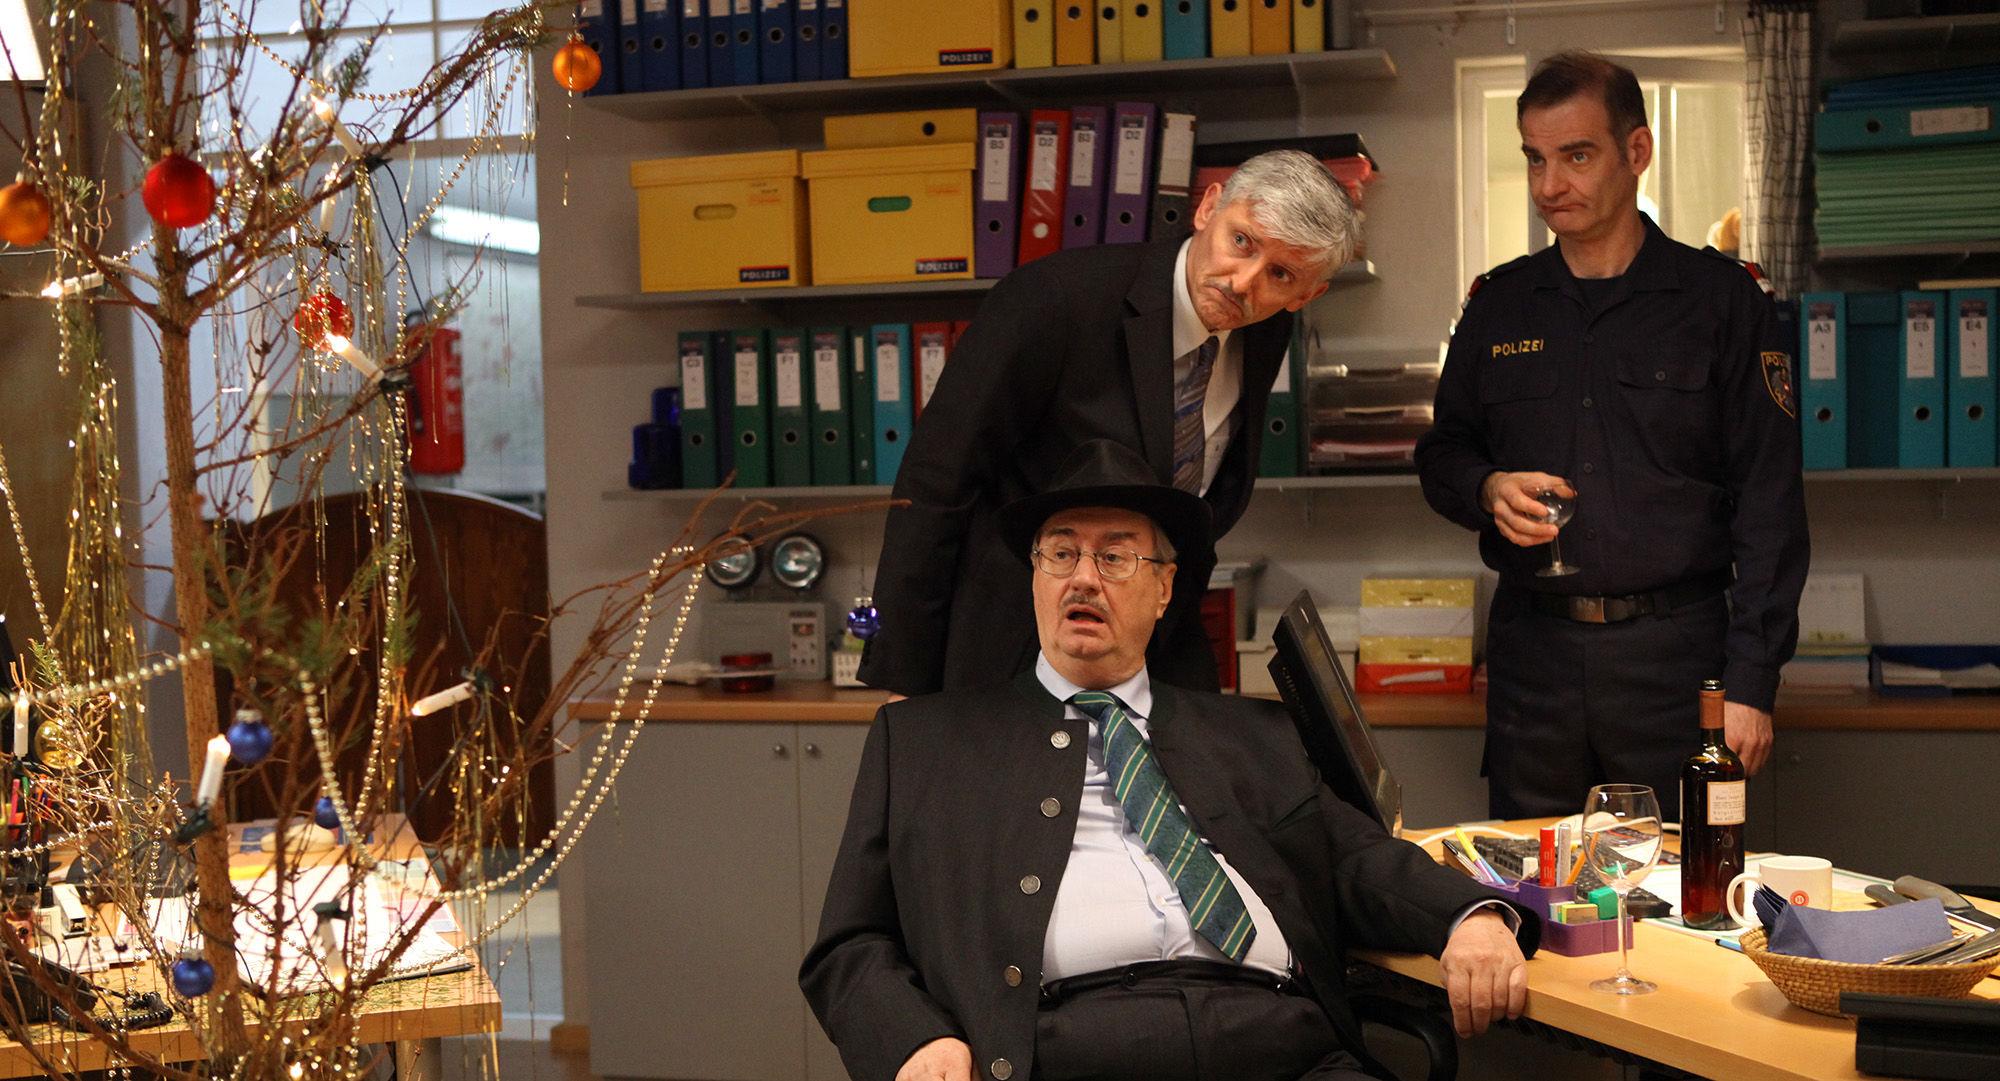 Gerhard Zemann (Chefinspektor Zirmgiebel), Manfred Dungl (Traugott Pimpf), Heinrich Schafmeister (Udo Maulhart)